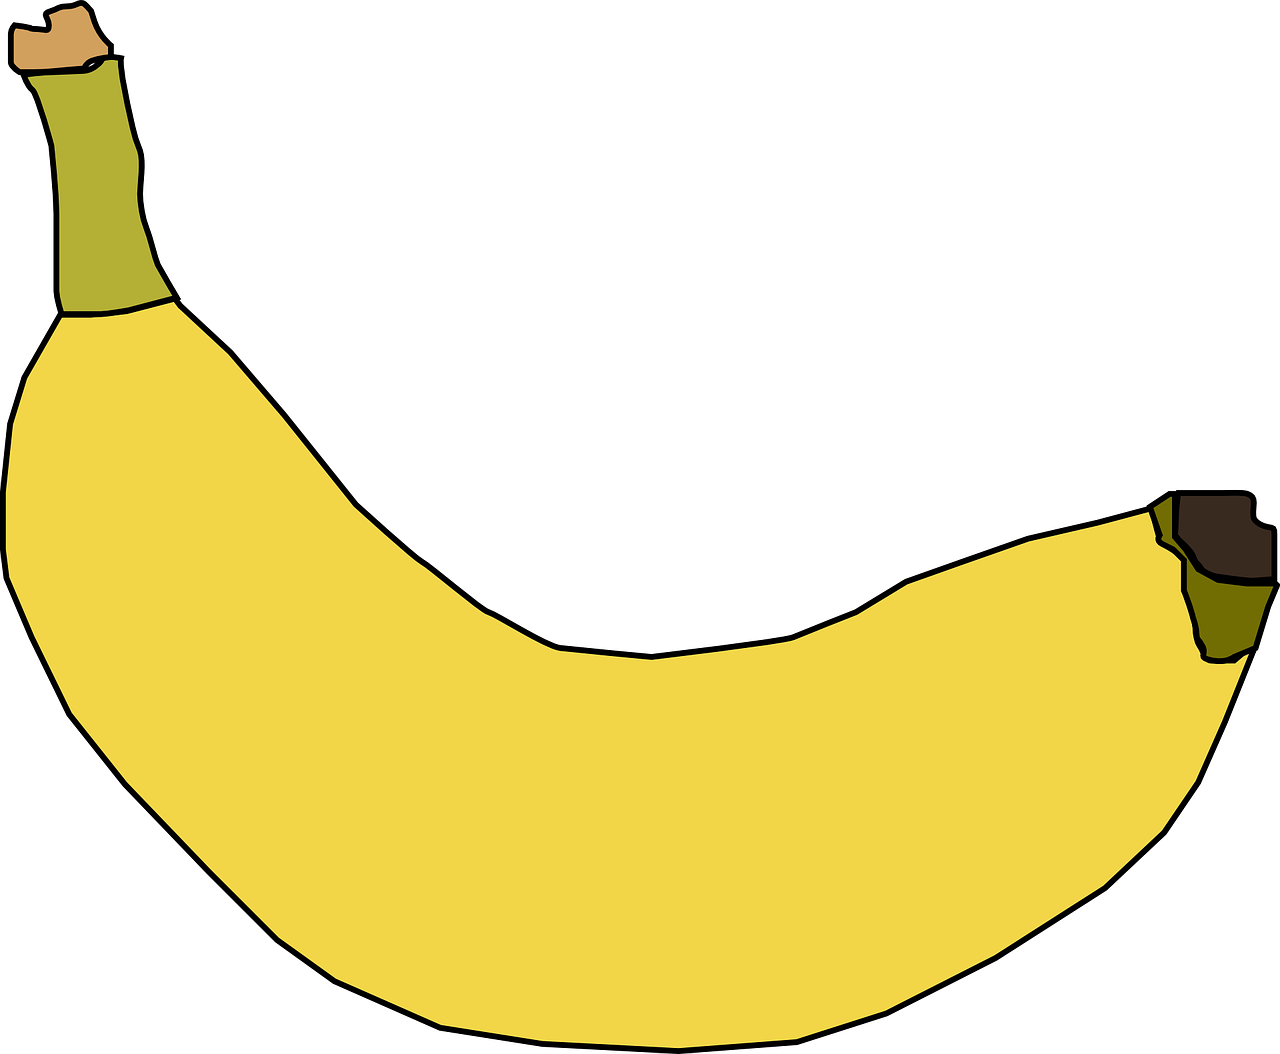 graphic library download Banana yellow fruit sweet. Bananas vector ripe